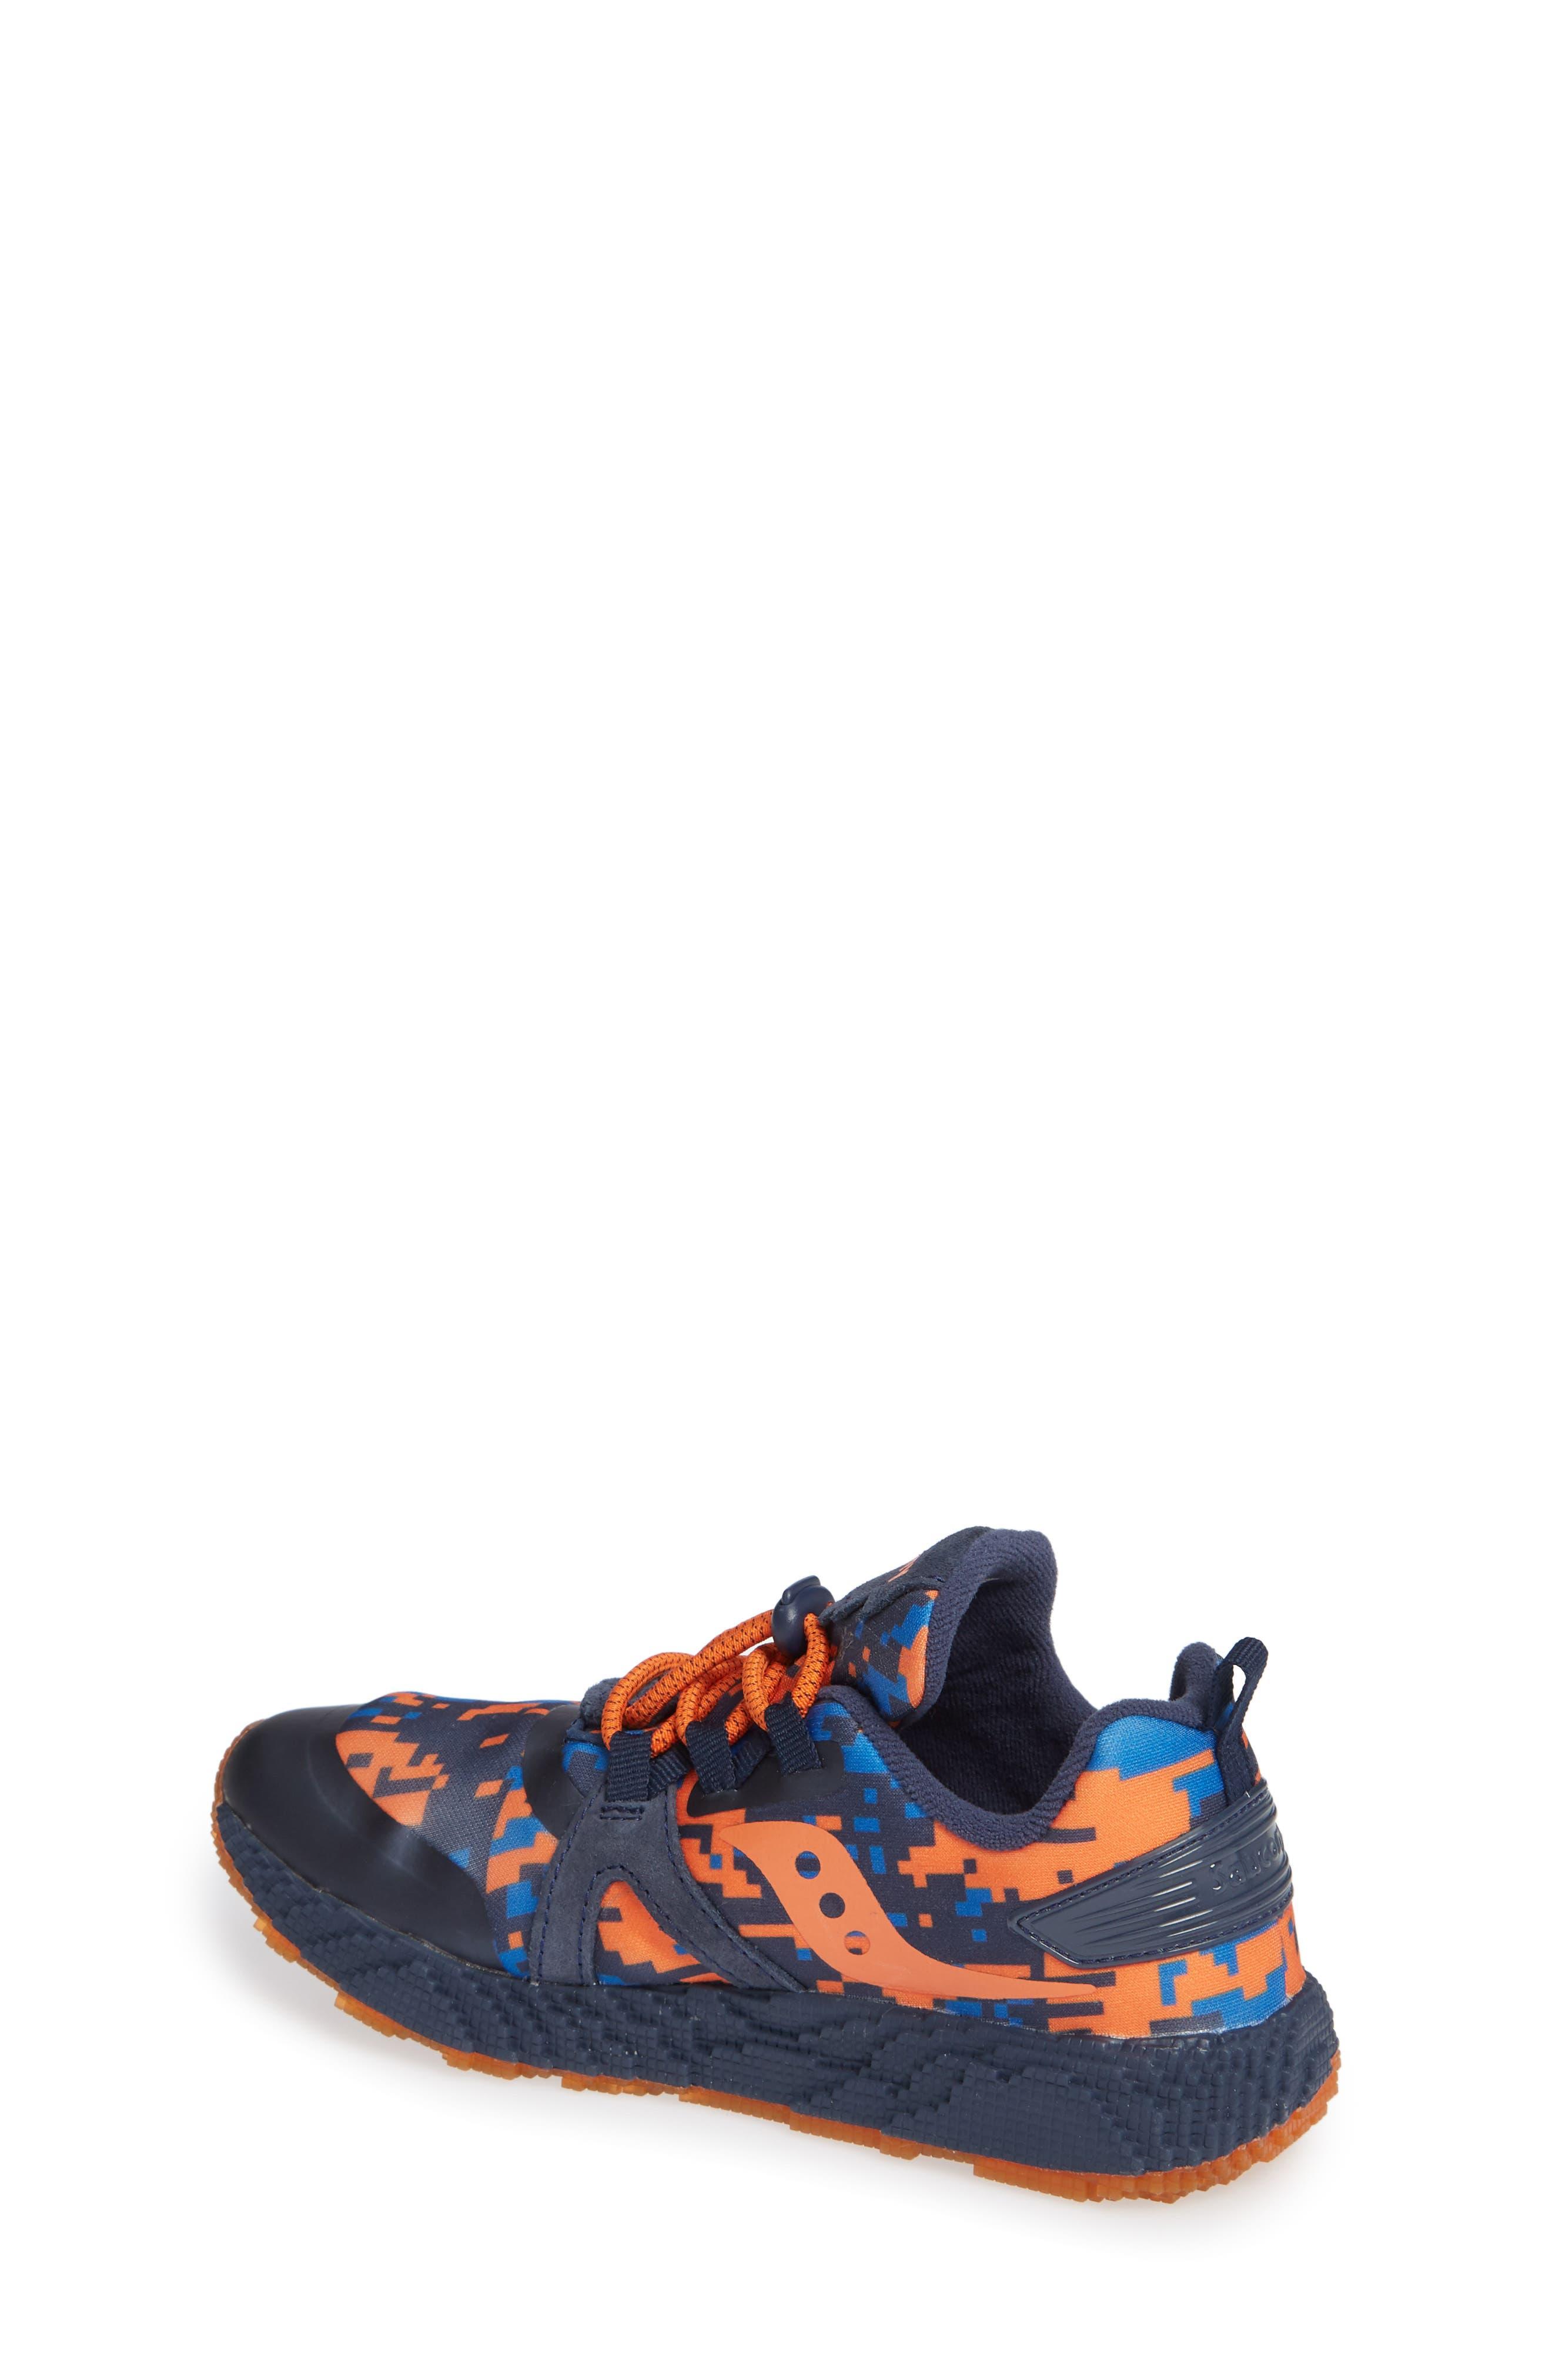 SAUCONY, Voxel 9000 Sneaker, Alternate thumbnail 2, color, BLUE LEATHER/ MESH